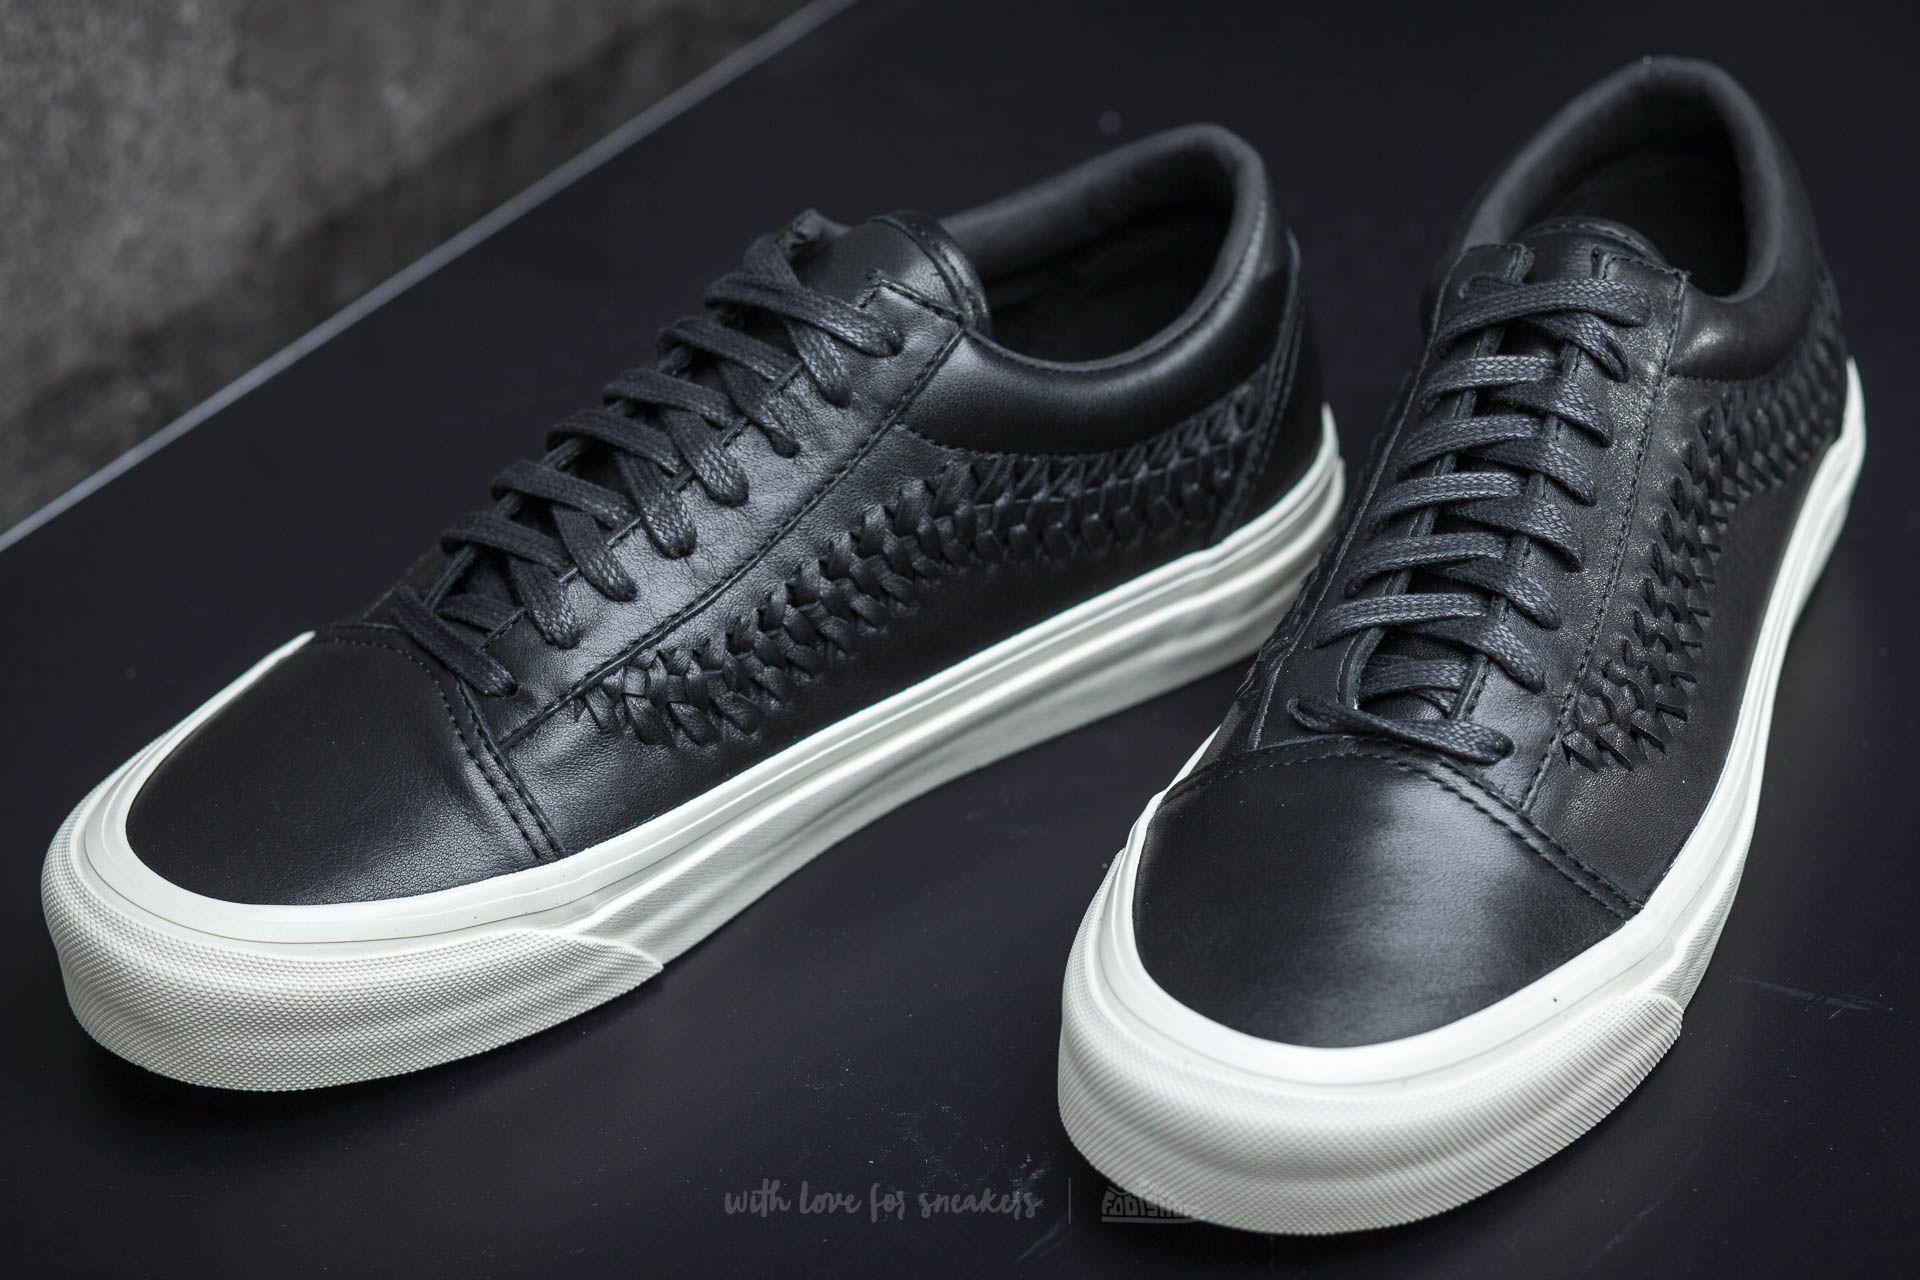 shoes Vans Old Skool Weave DX Leather